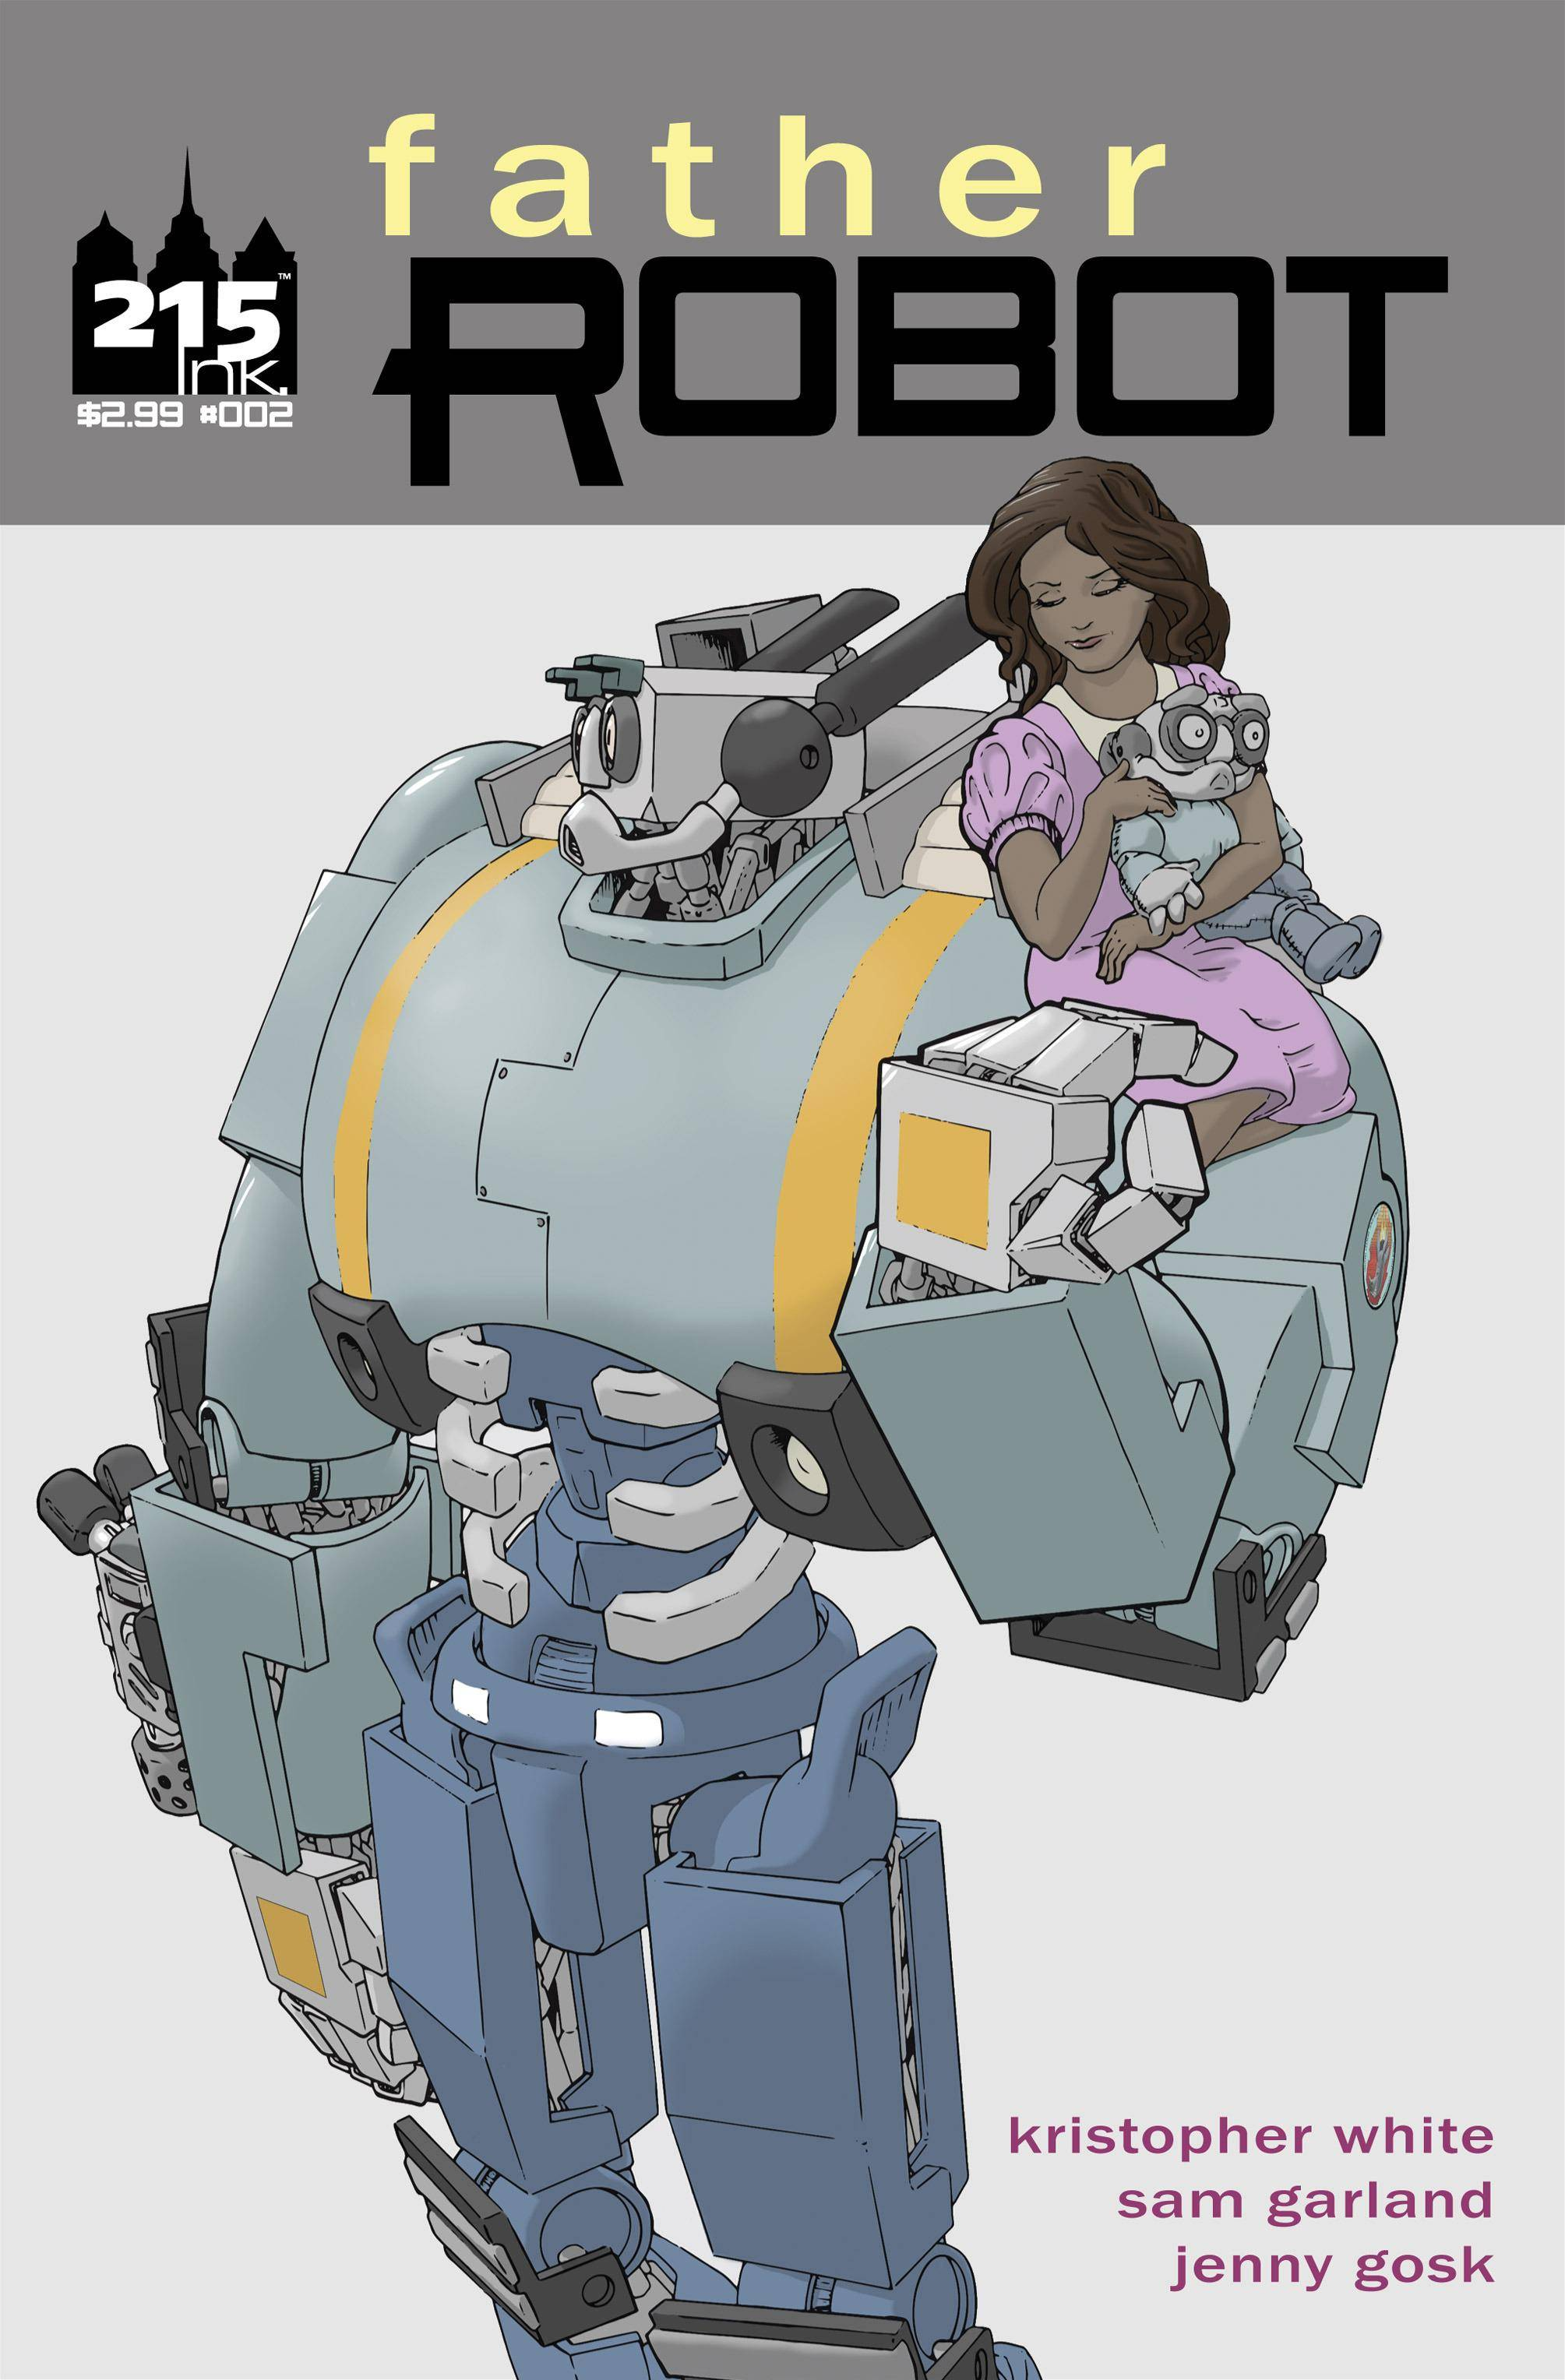 New Releases 2015 2 27 - Father Robot 02 2014 digital dargh-Empire cbr